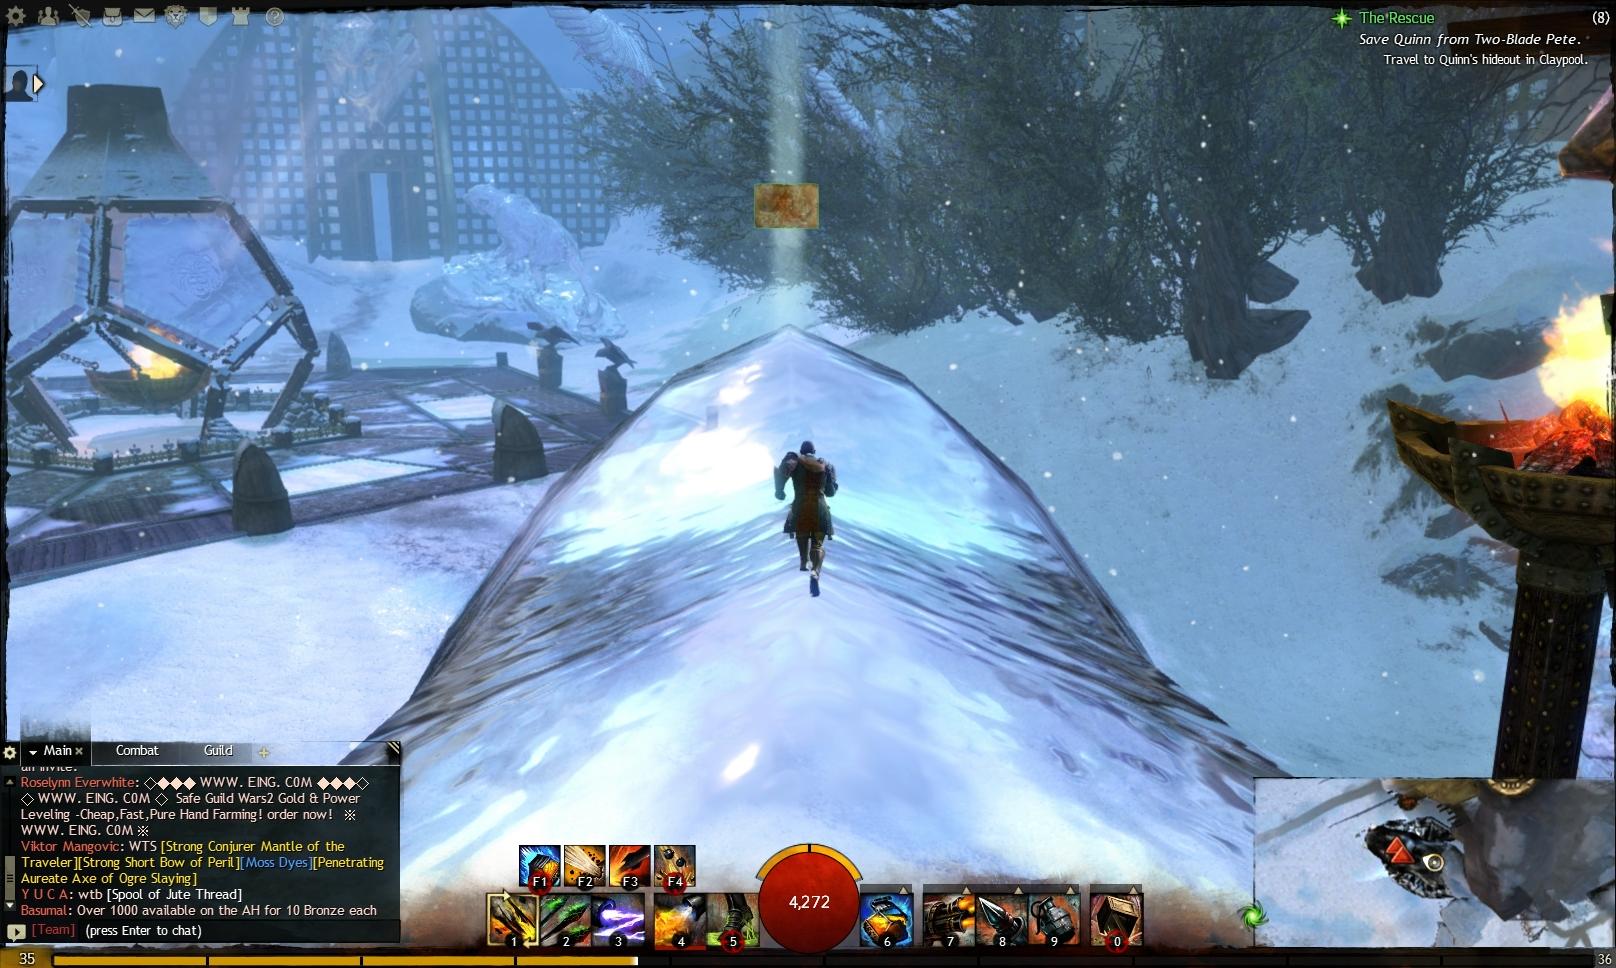 Guild Wars 2 - Vistas in Hoelbrak - 01 Bear Lodge